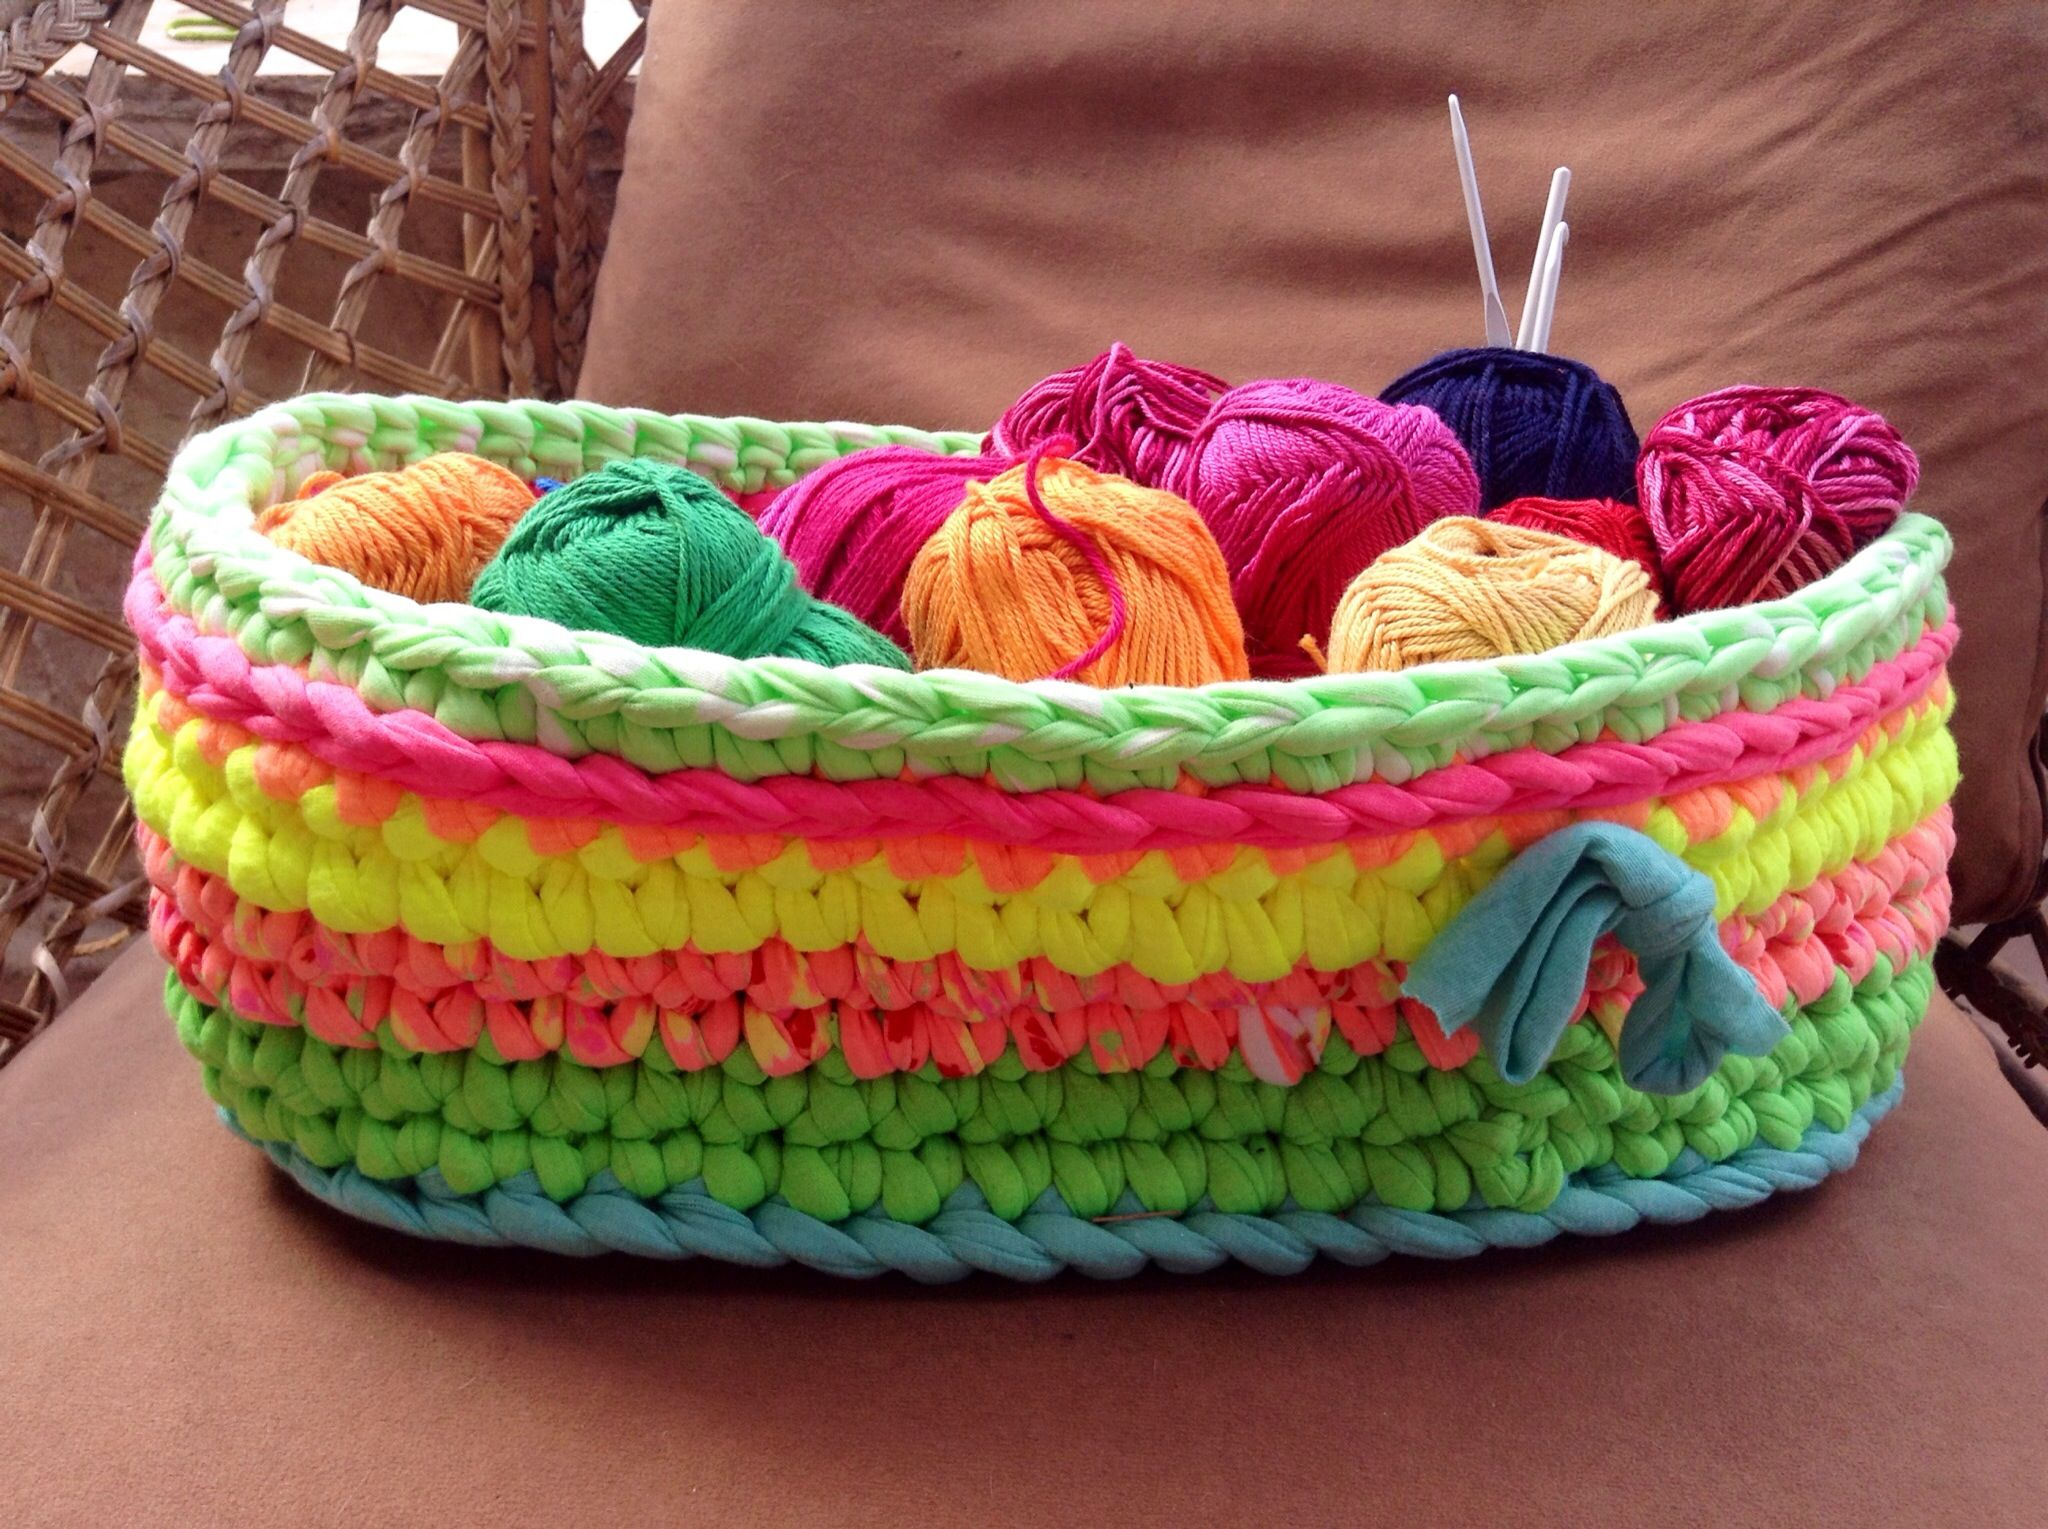 My Oval crochet baskets. Yummy (;